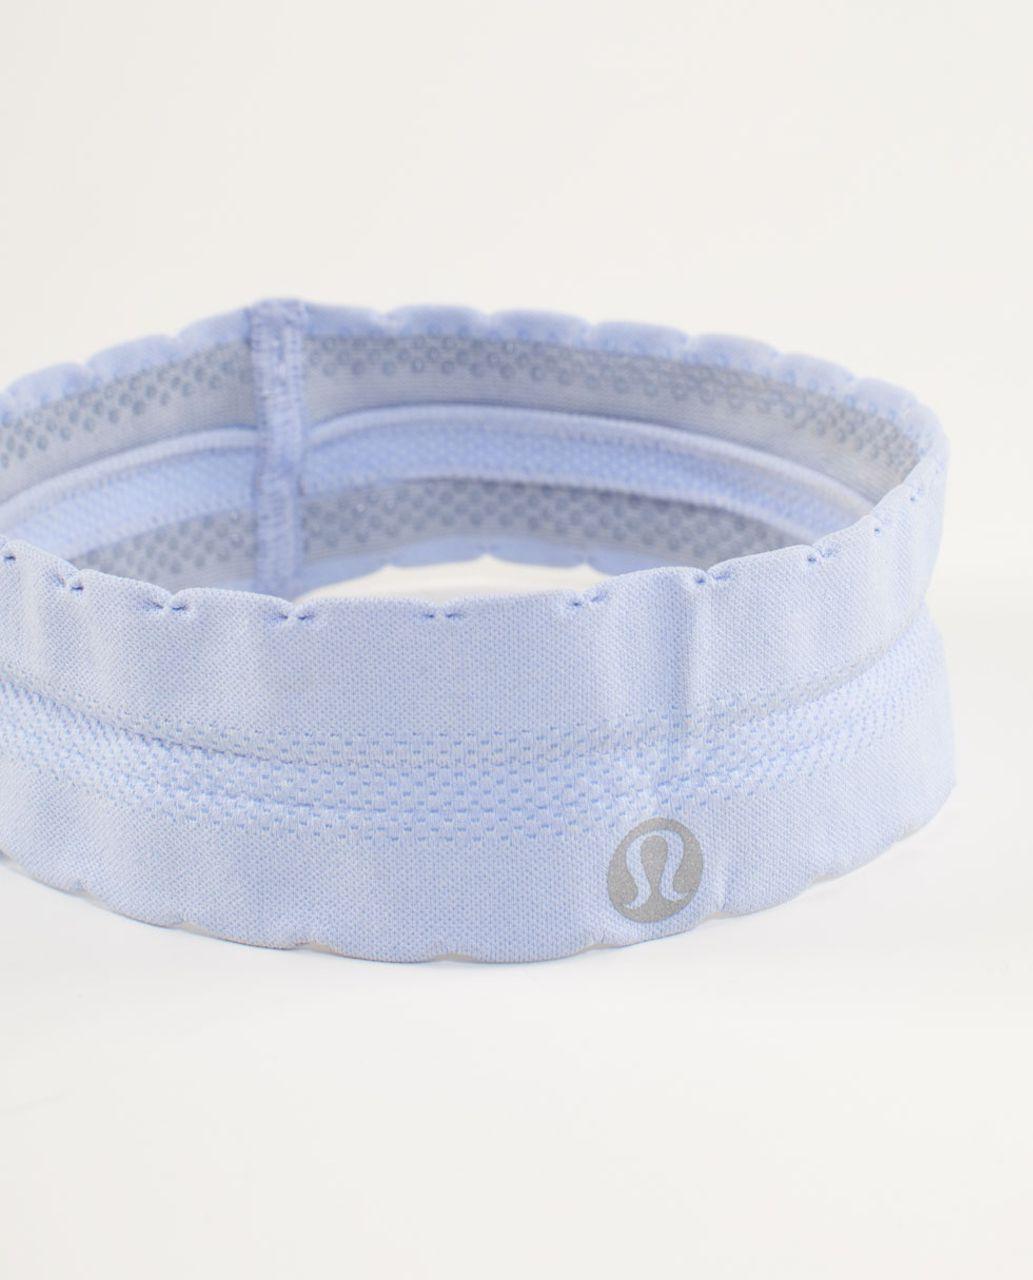 Lululemon Swiftly Headband - Lavender Dusk